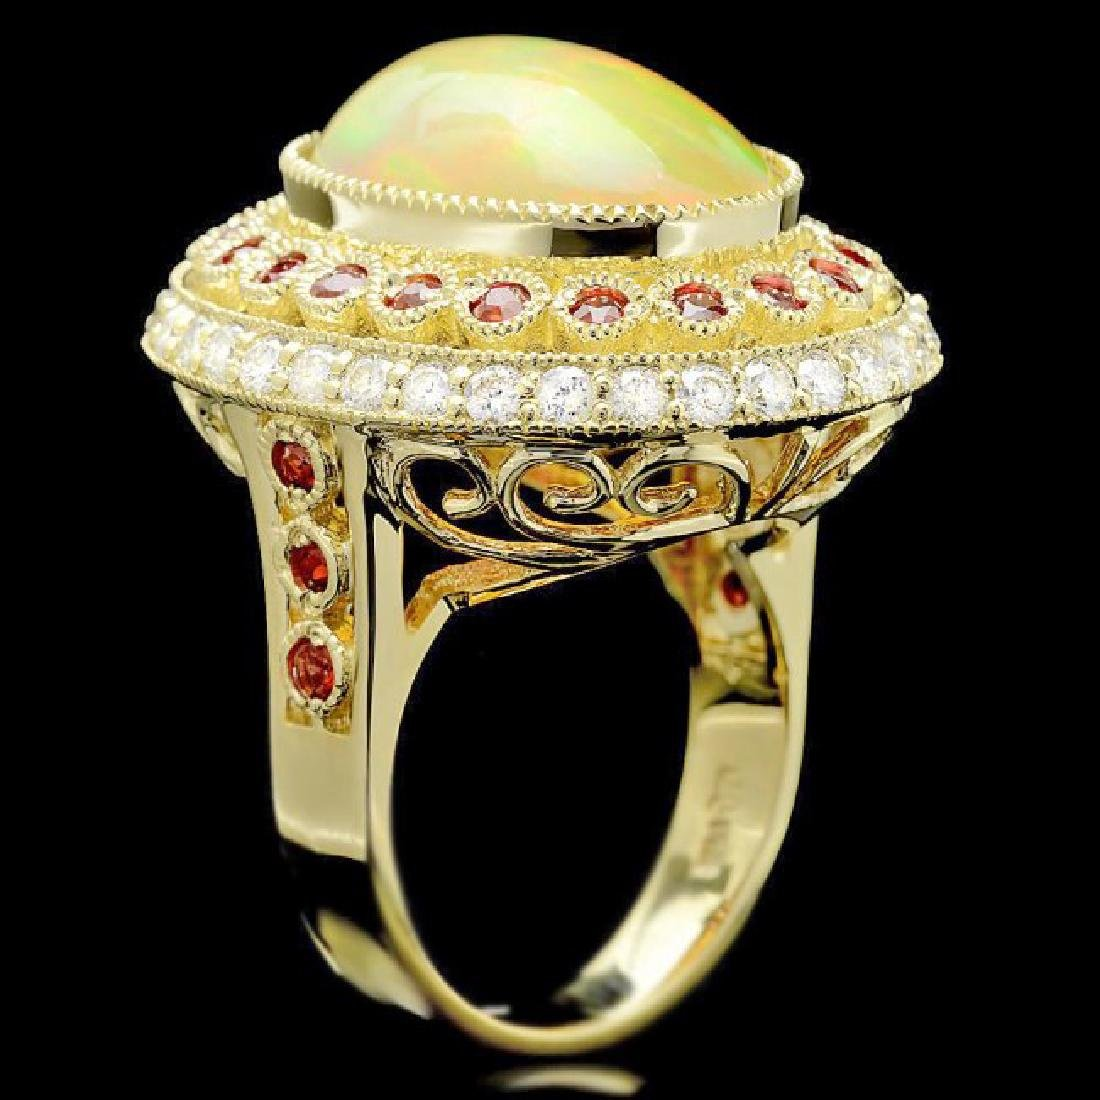 14k Yellow Gold 8.00ct Opal 1.20ct Diamond Ring - 2